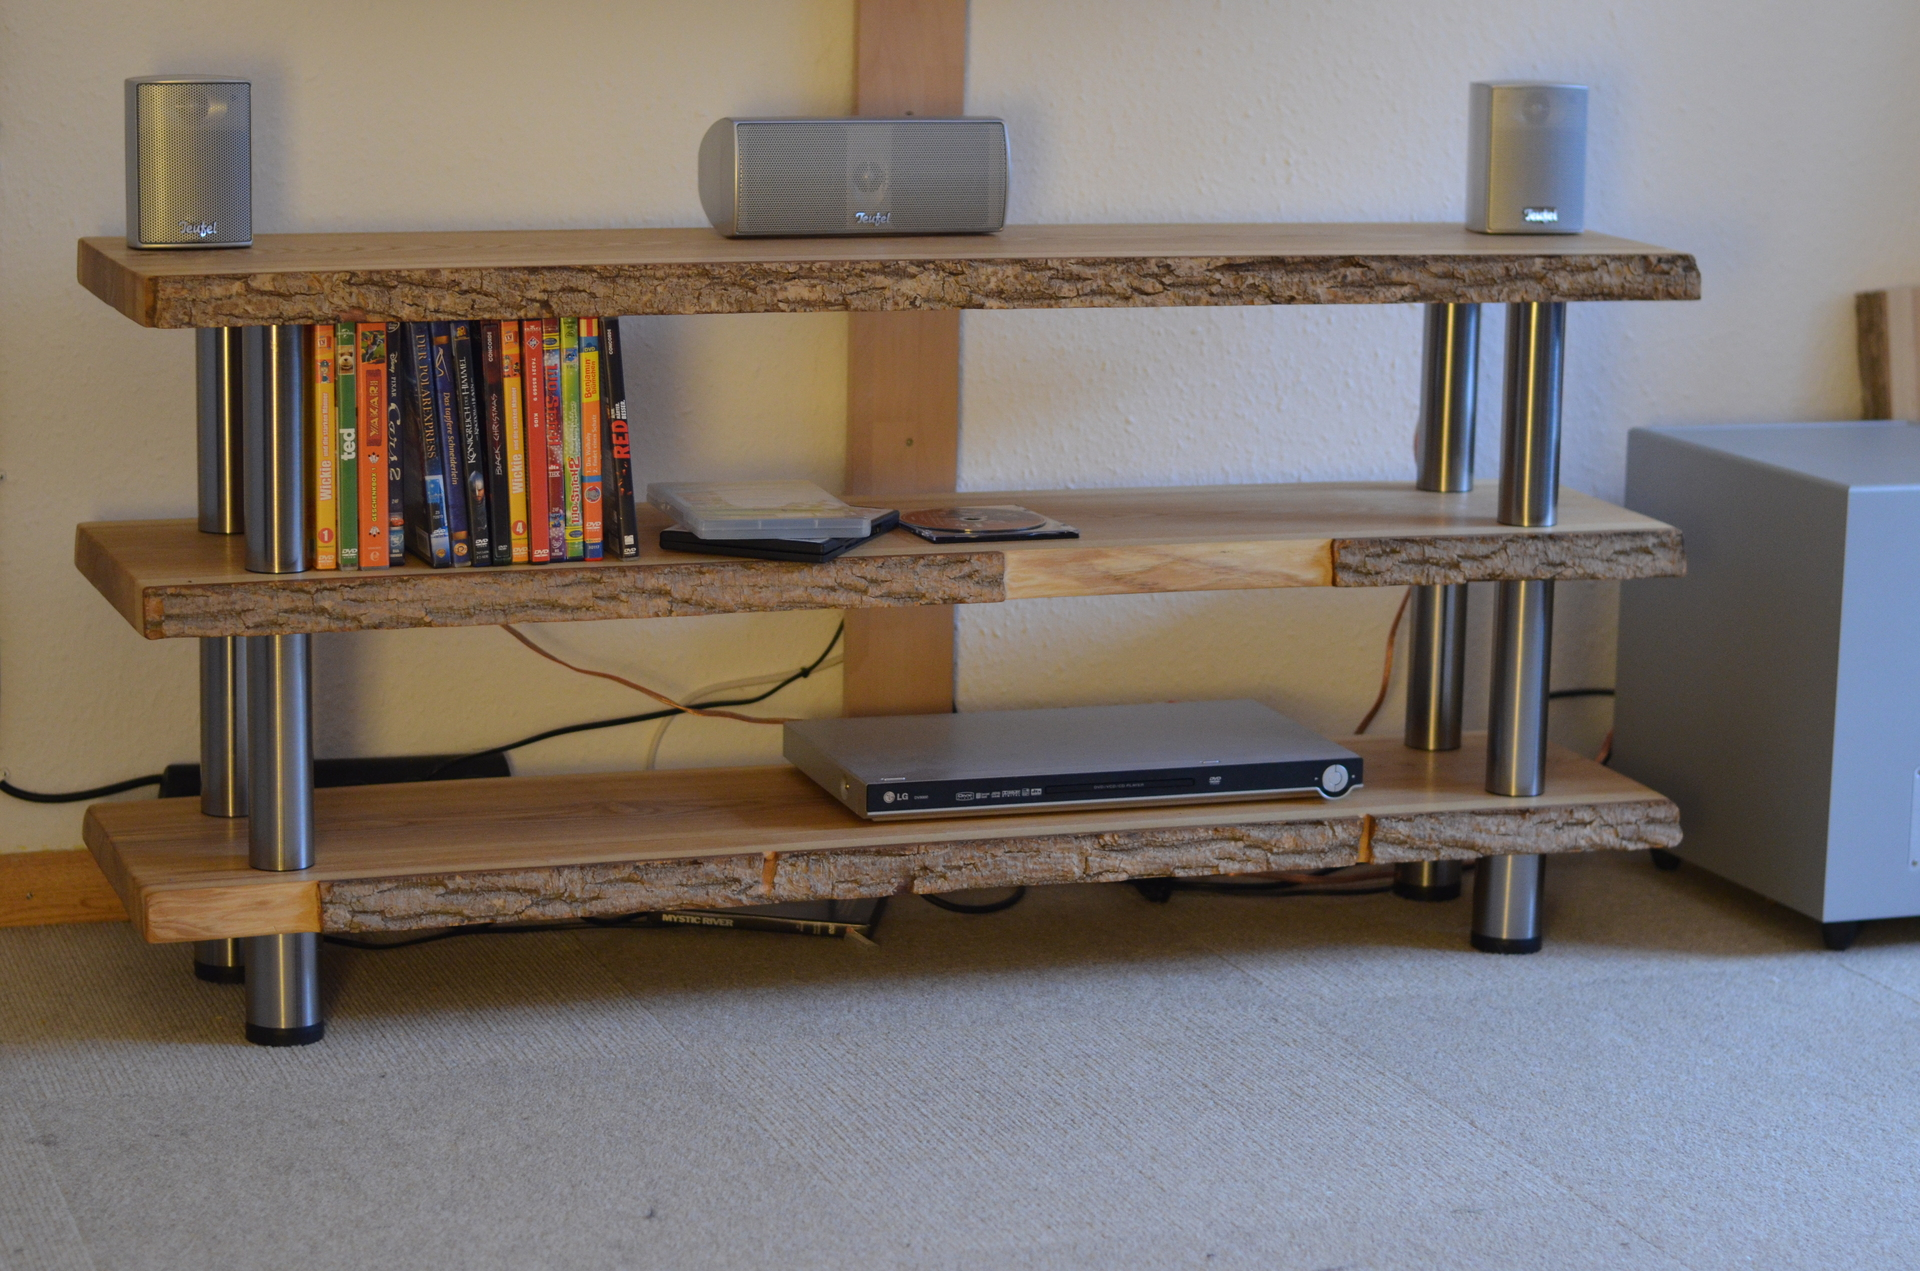 massiv esche lowboard doityourself esche lowboard. Black Bedroom Furniture Sets. Home Design Ideas